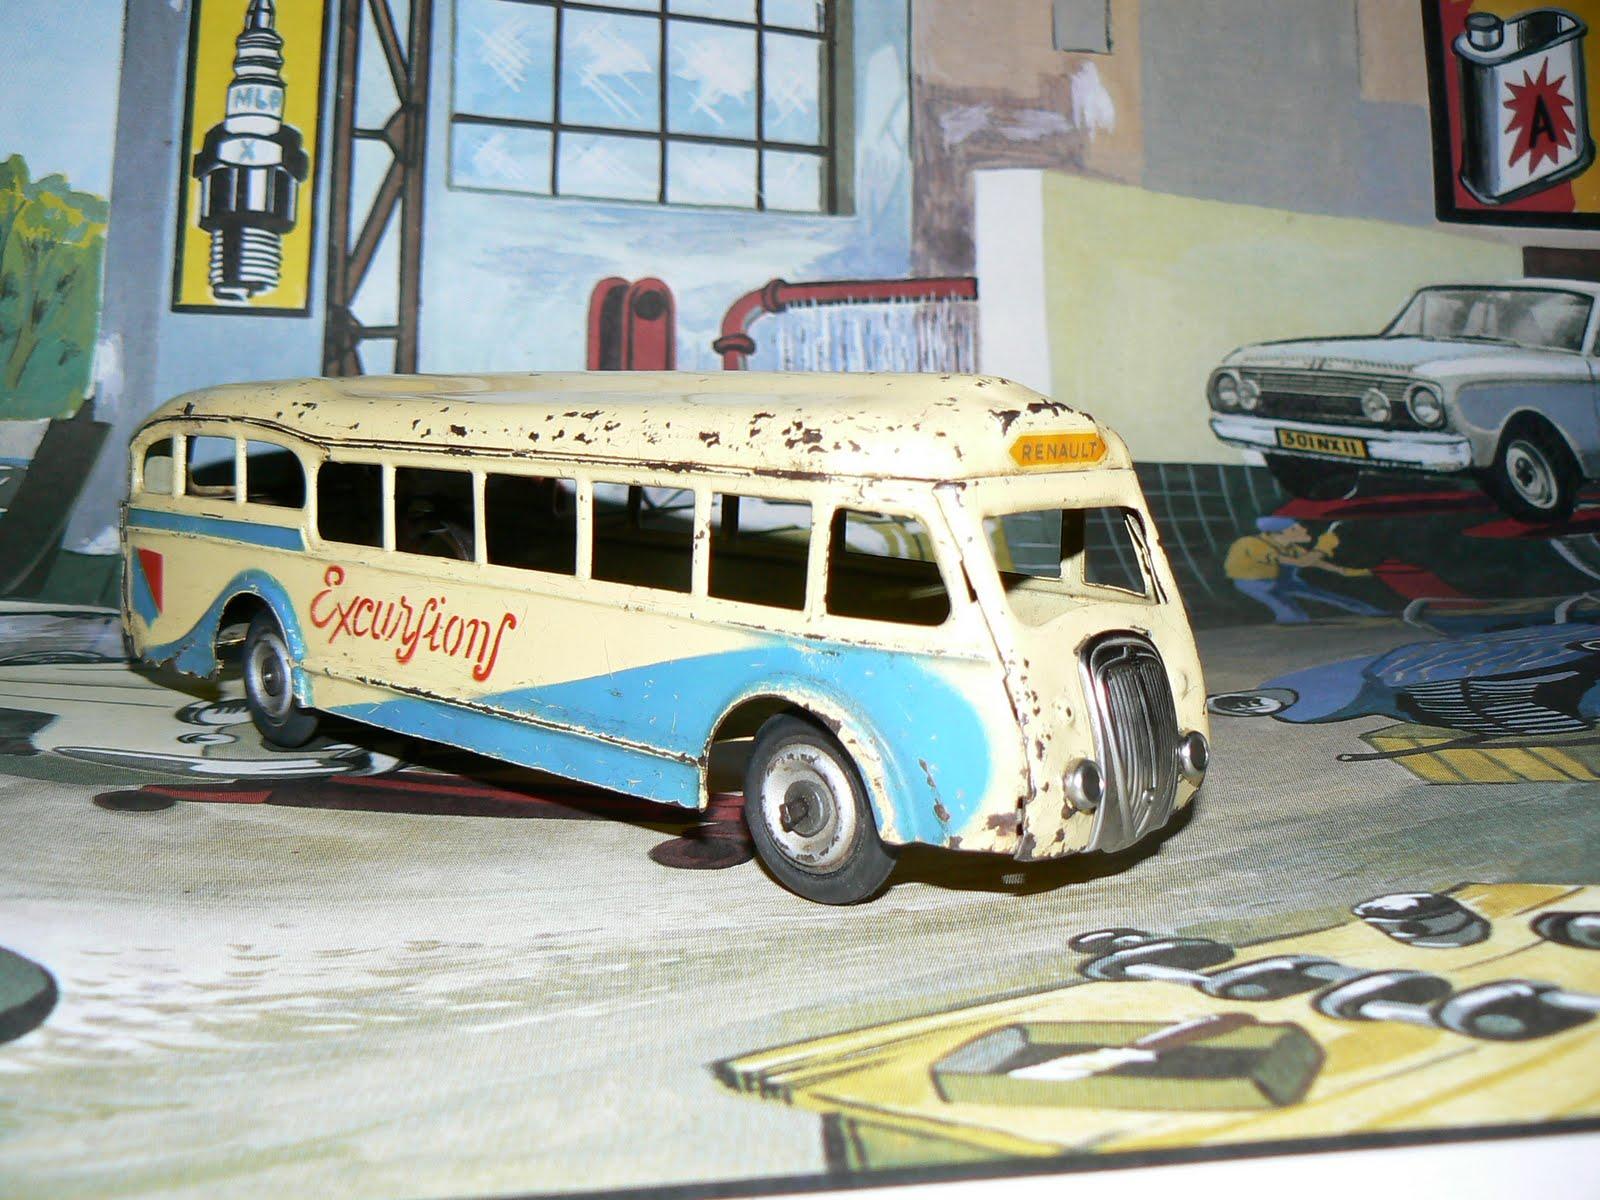 i Jouets j Renault AnciensSortie Garage De Adtd C Bus I6Y7vfbgy